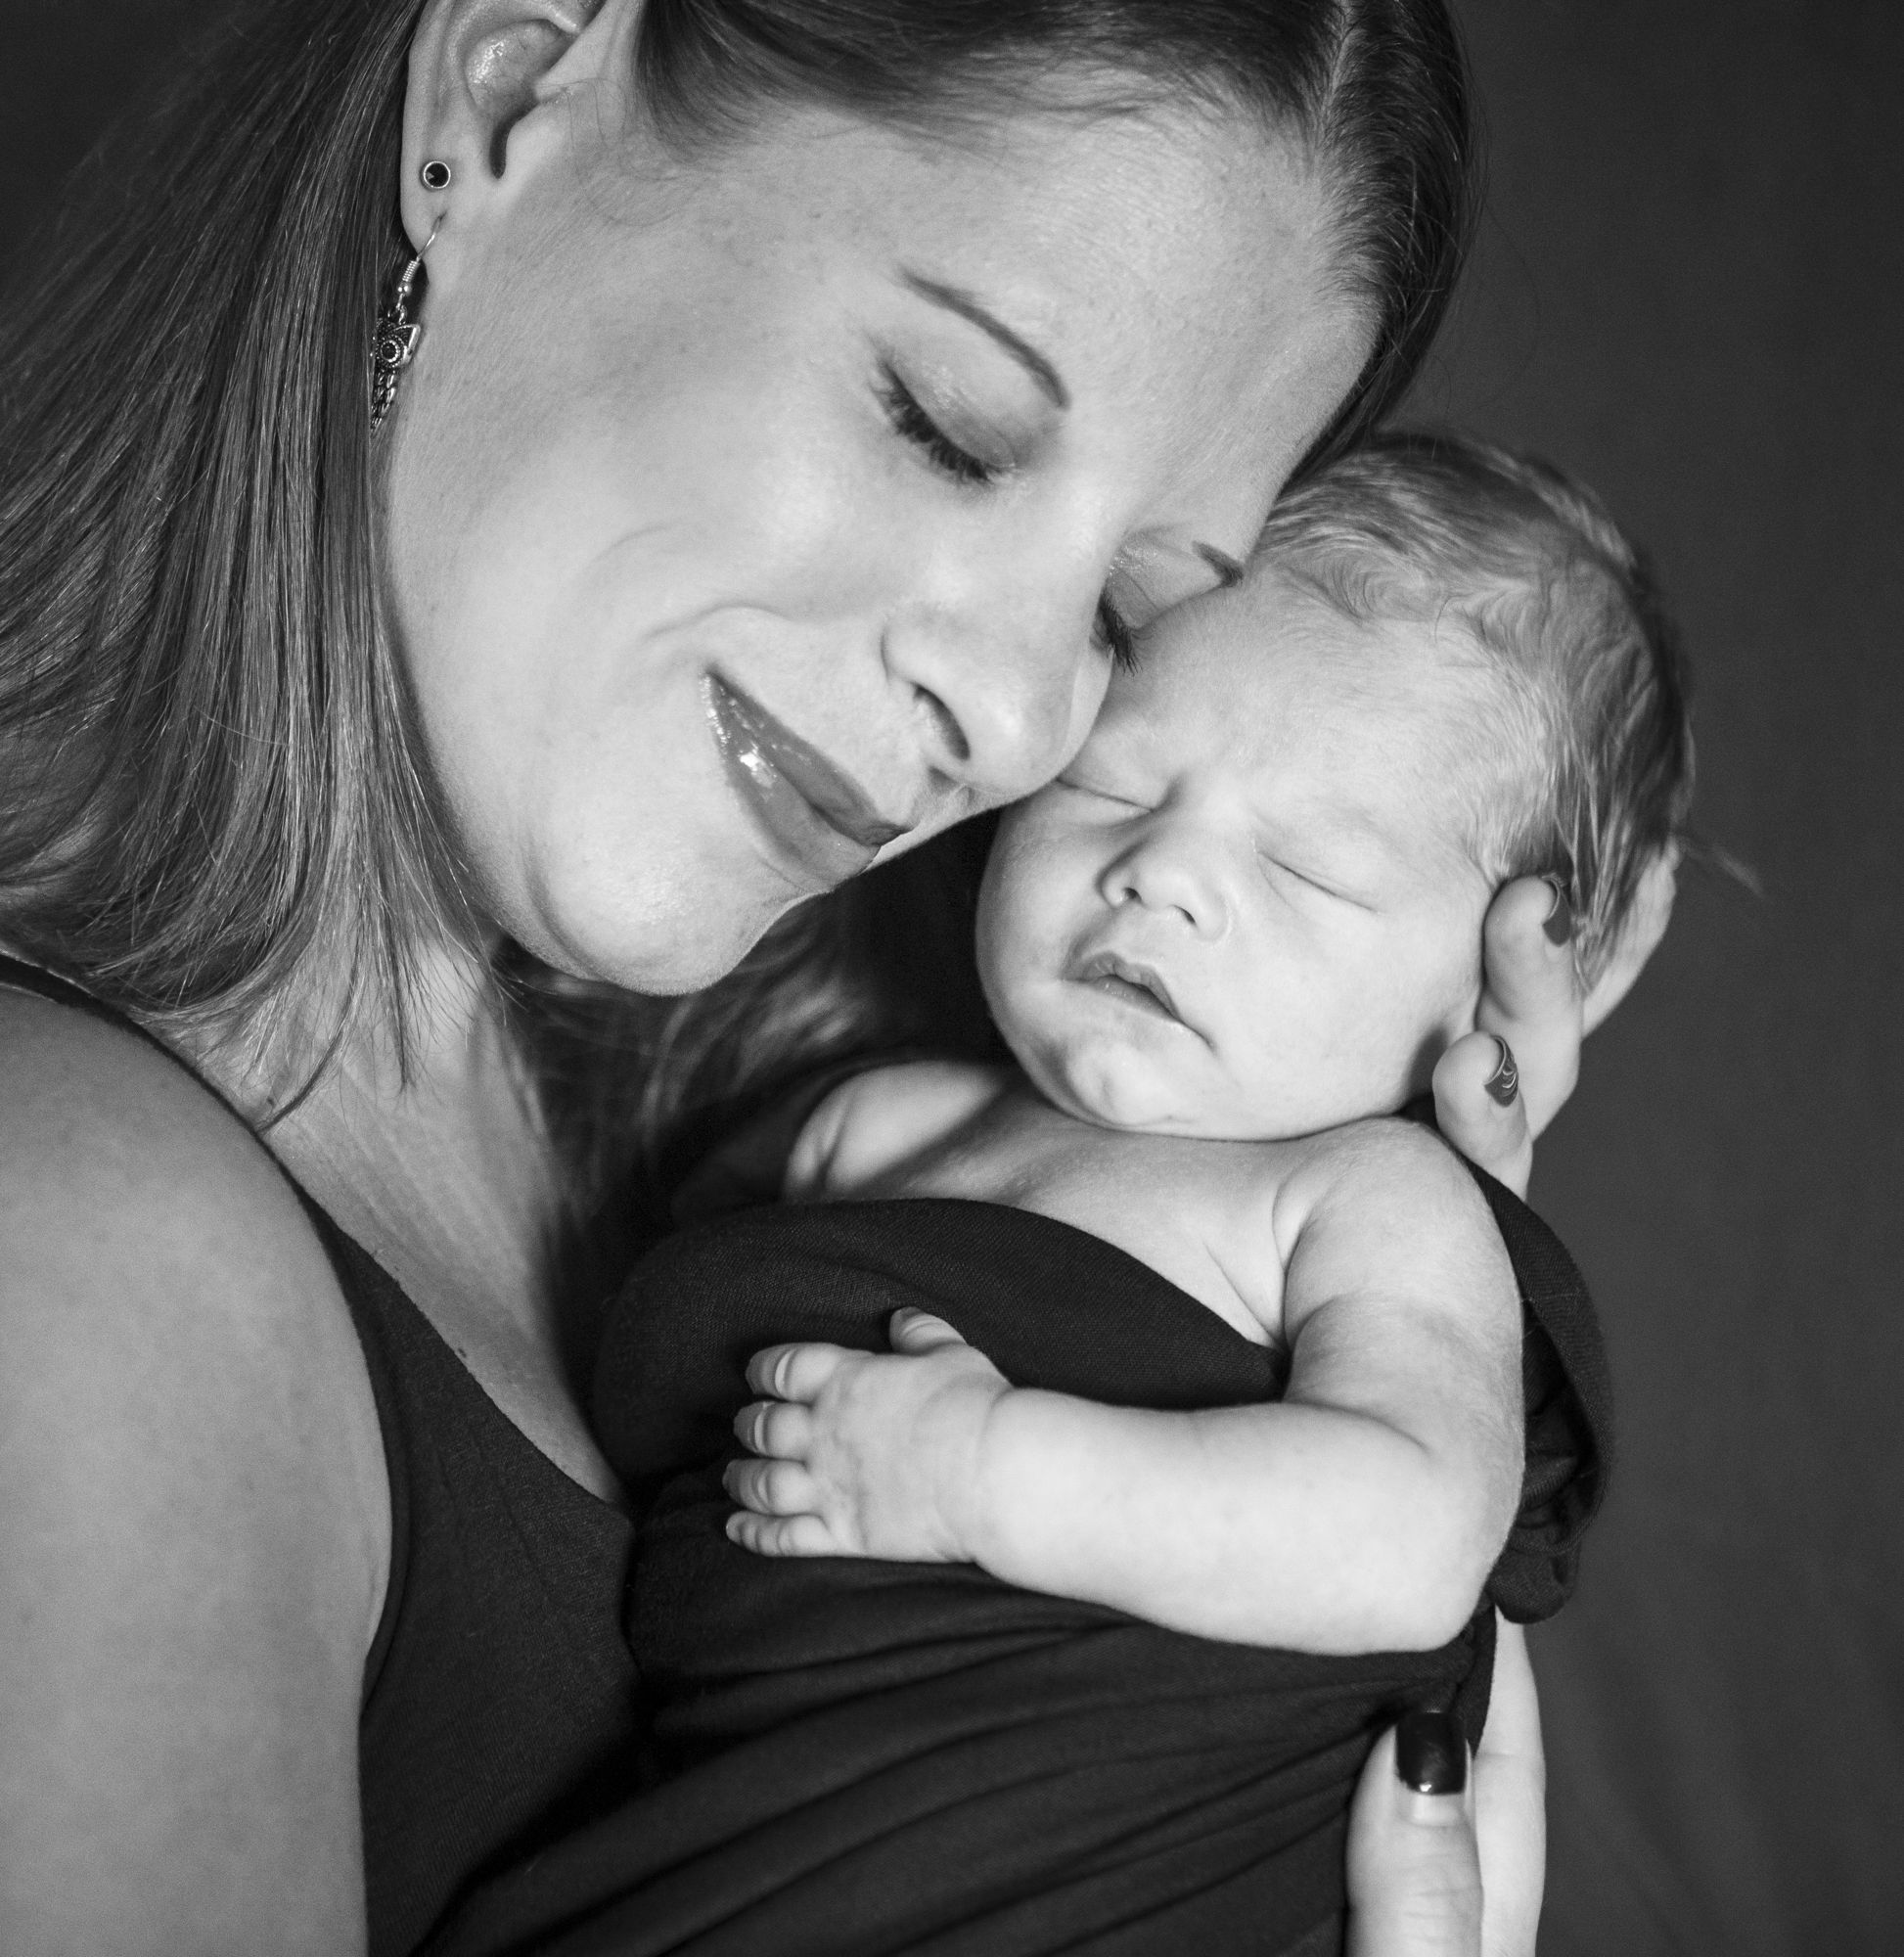 Baby Kyllian Newborn Portrait Session with Studio Misha Photogrpahy_BLOG-45.jpg